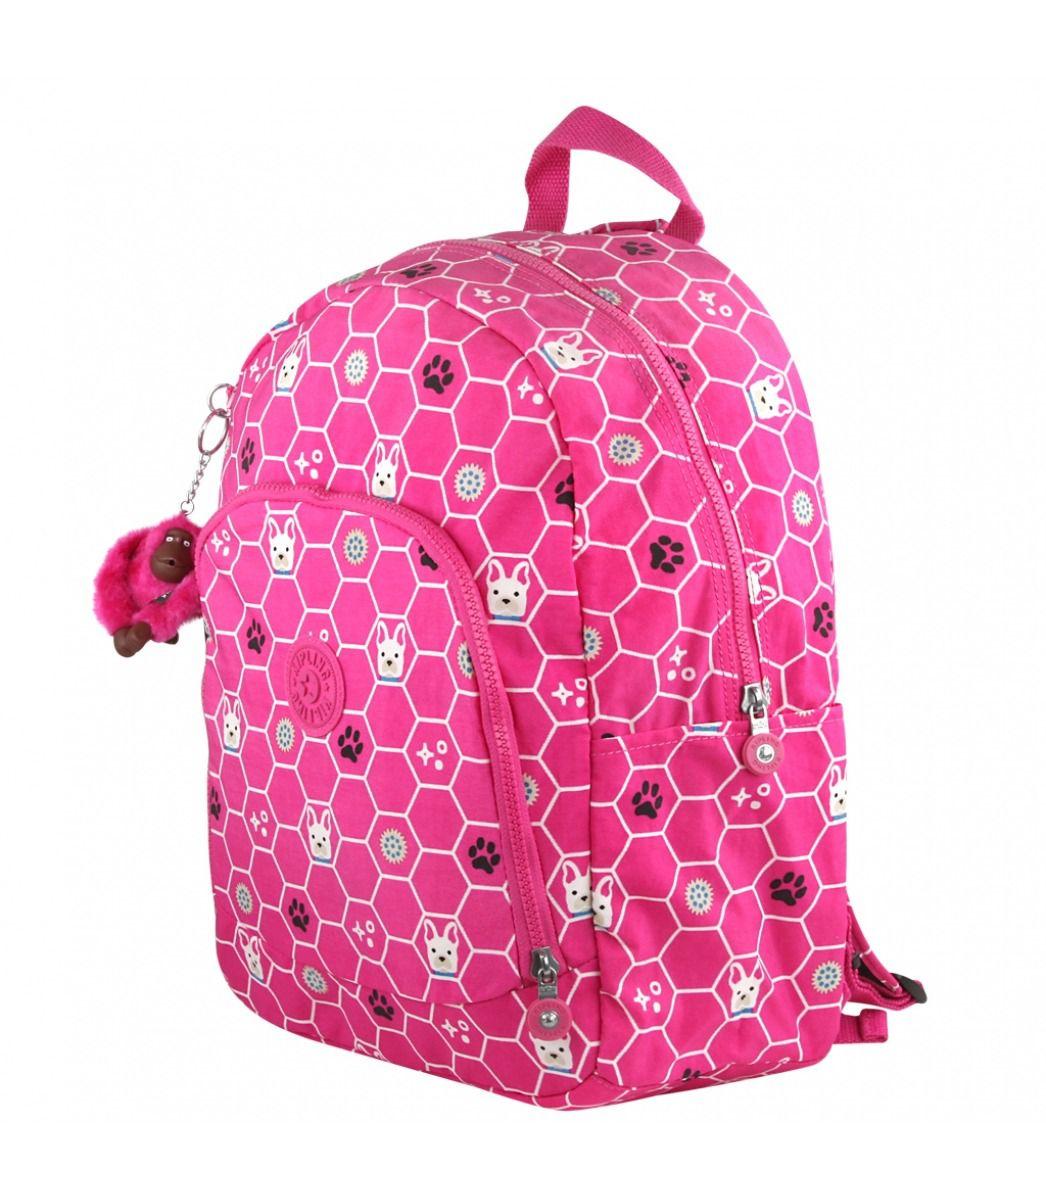 Mochila Escolar Kipling Carmine Pink Dog